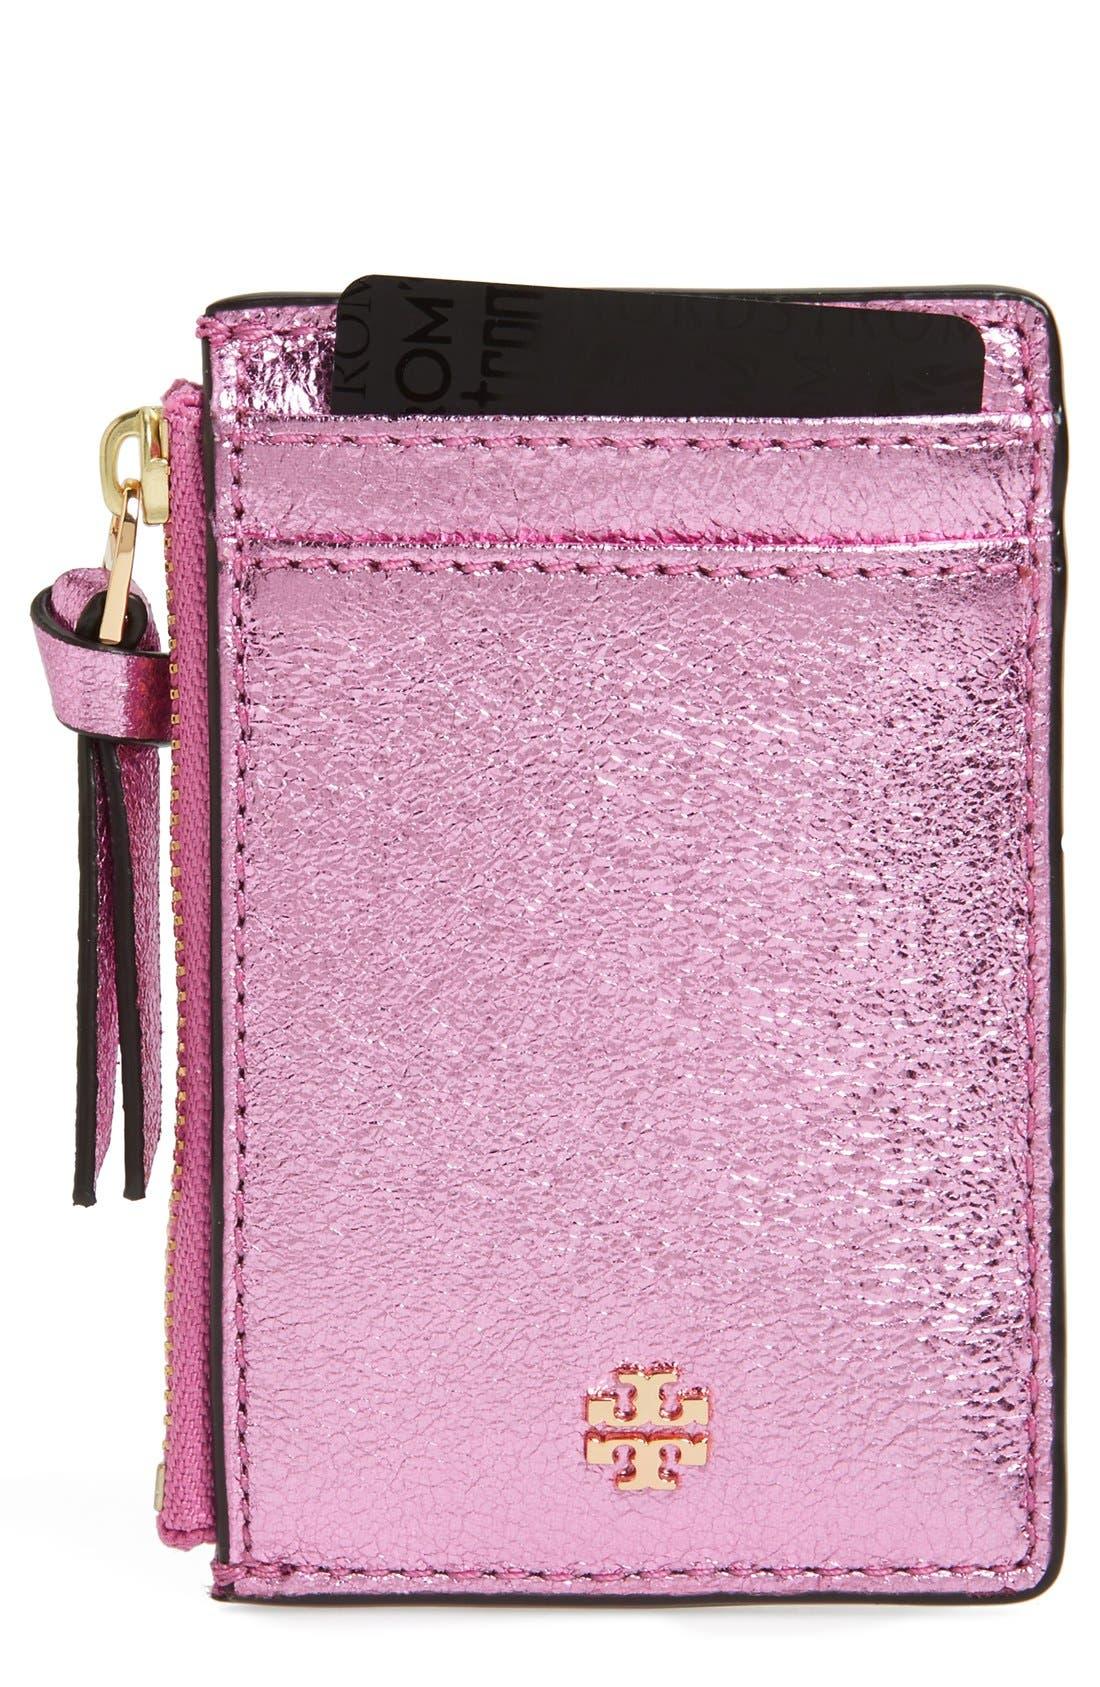 Main Image - Tory Burch Crinkle Metallic Leather Card Case